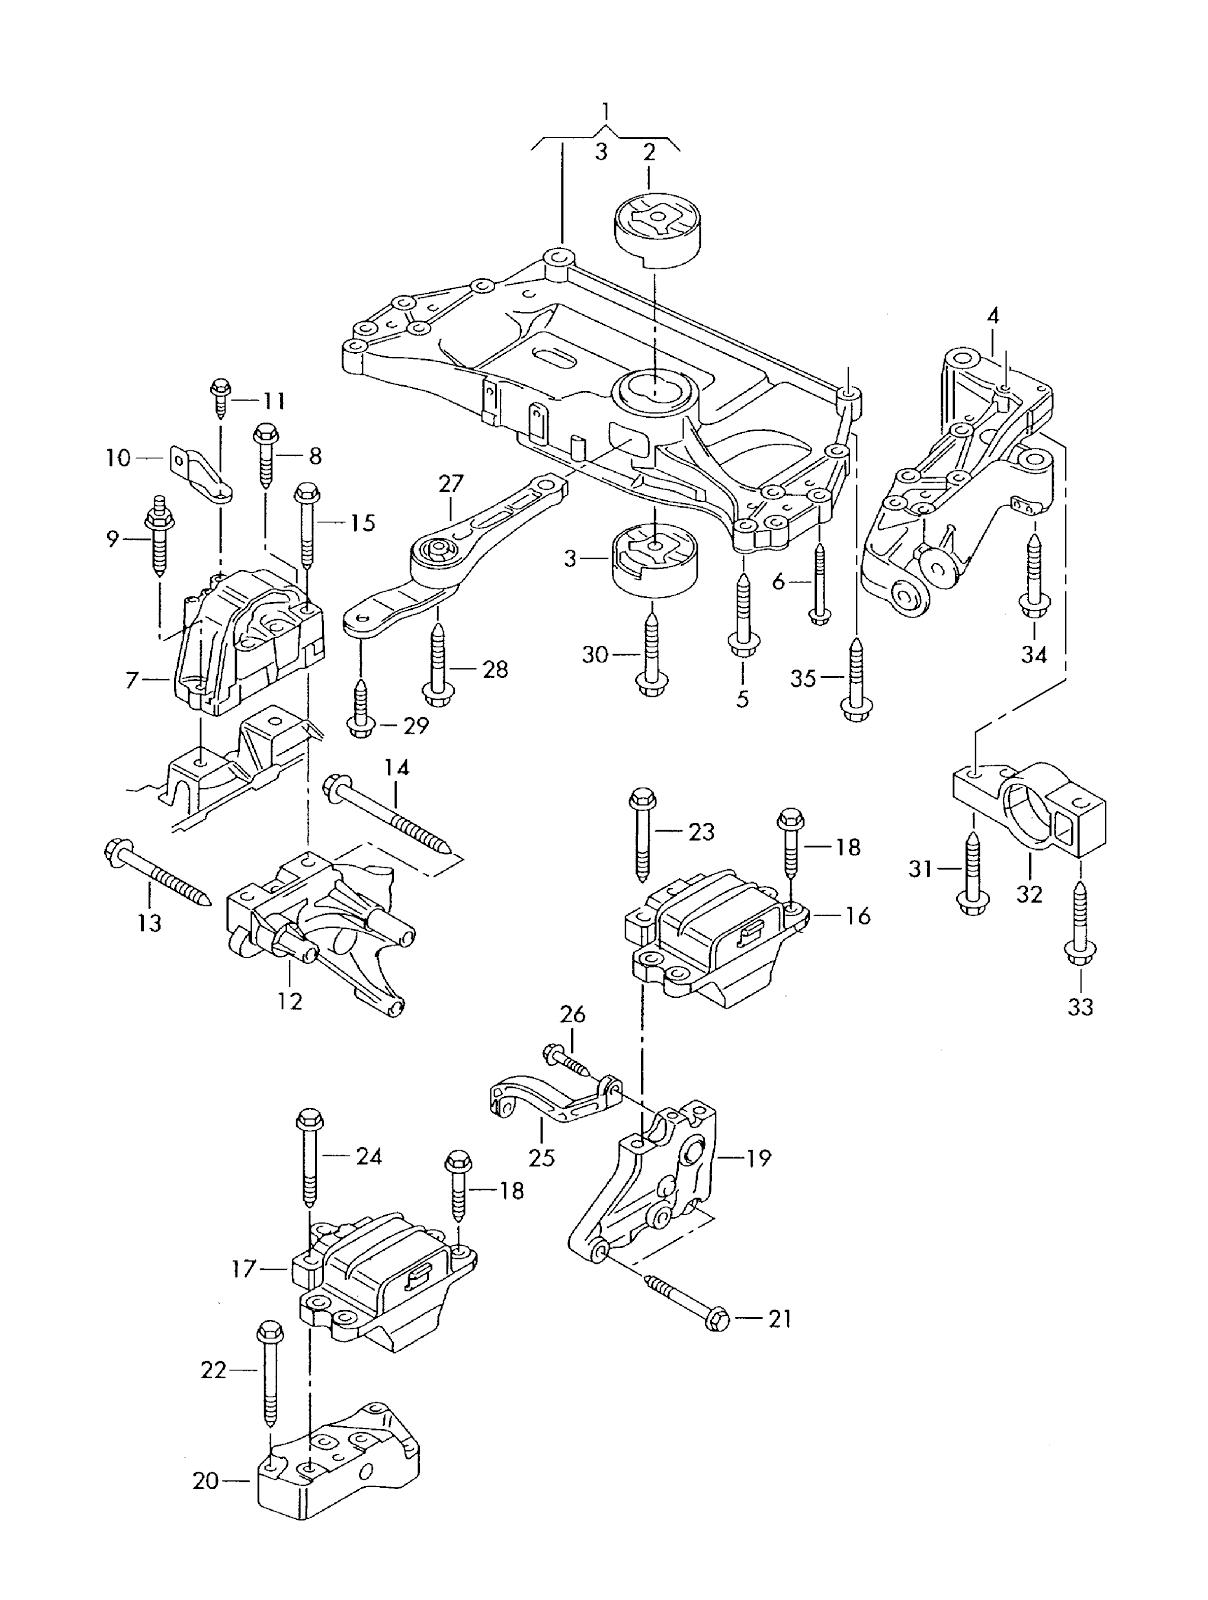 1600cc vw engine part diagram wiring diagram database 1600Cc VW Engine Heads vw parts wiring diagram database vw bug engine diagram 1600cc vw engine part diagram